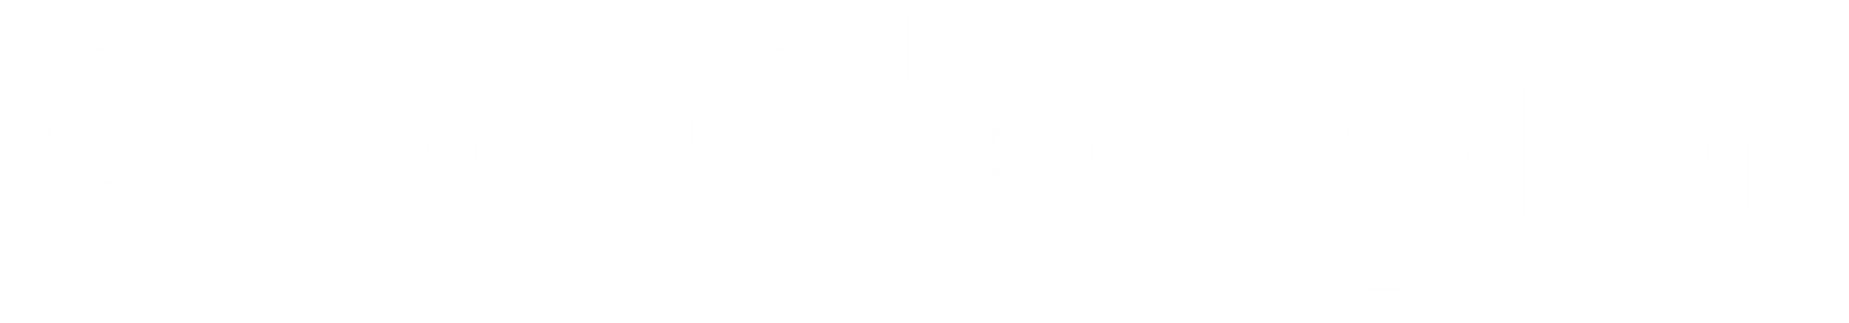 CyberChampion